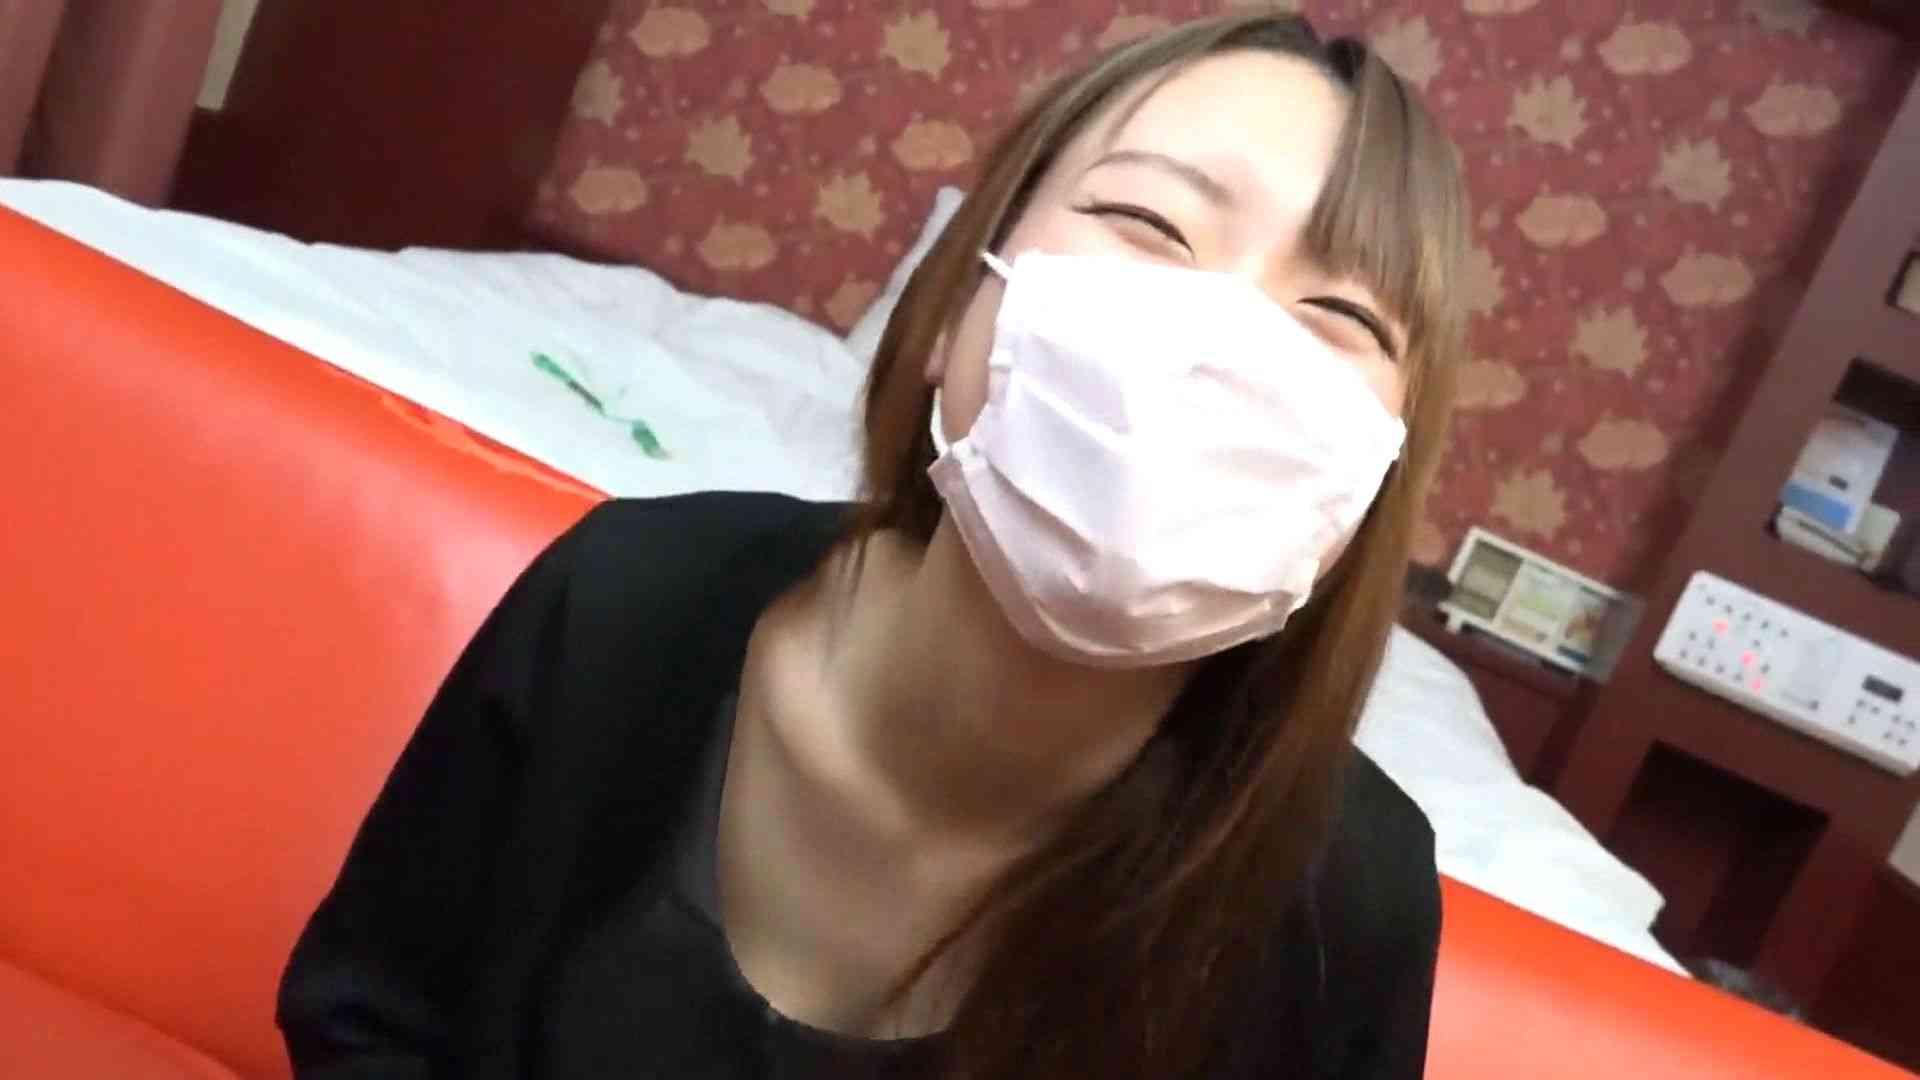 S級厳選美女ビッチガールVol.40 前編 美女  34連発 3